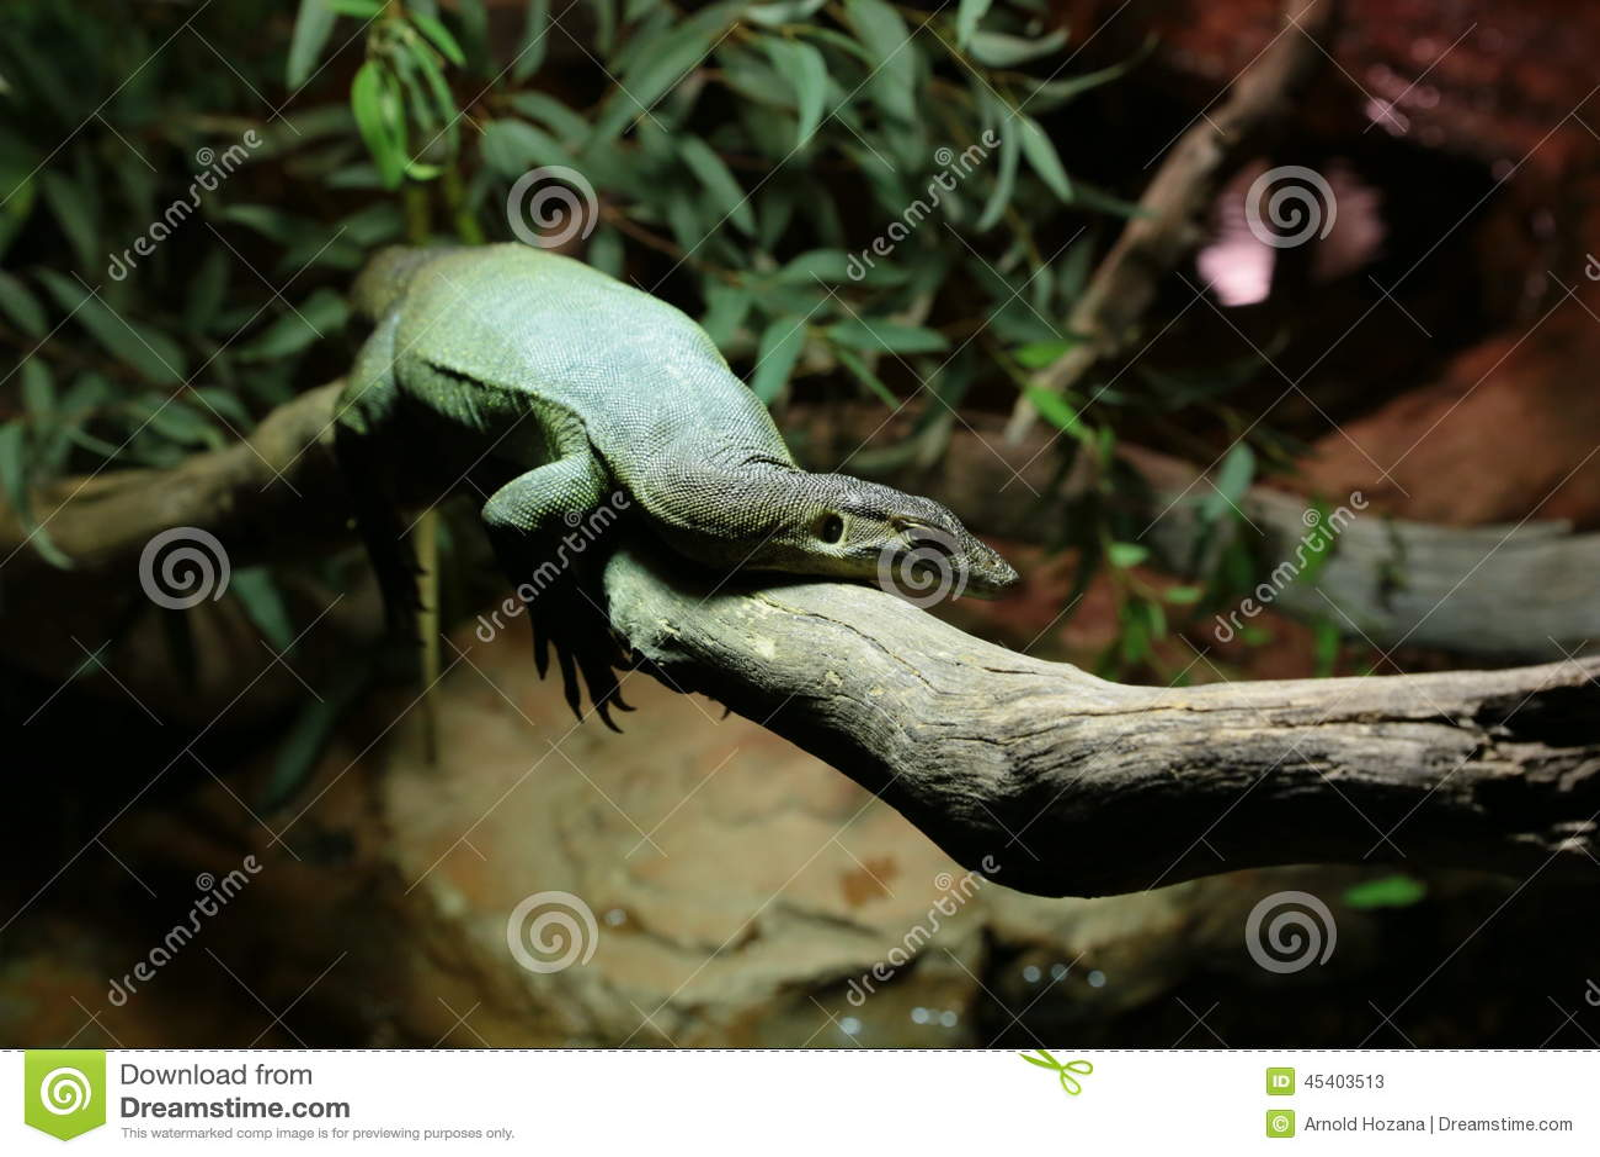 Lizard lazing around